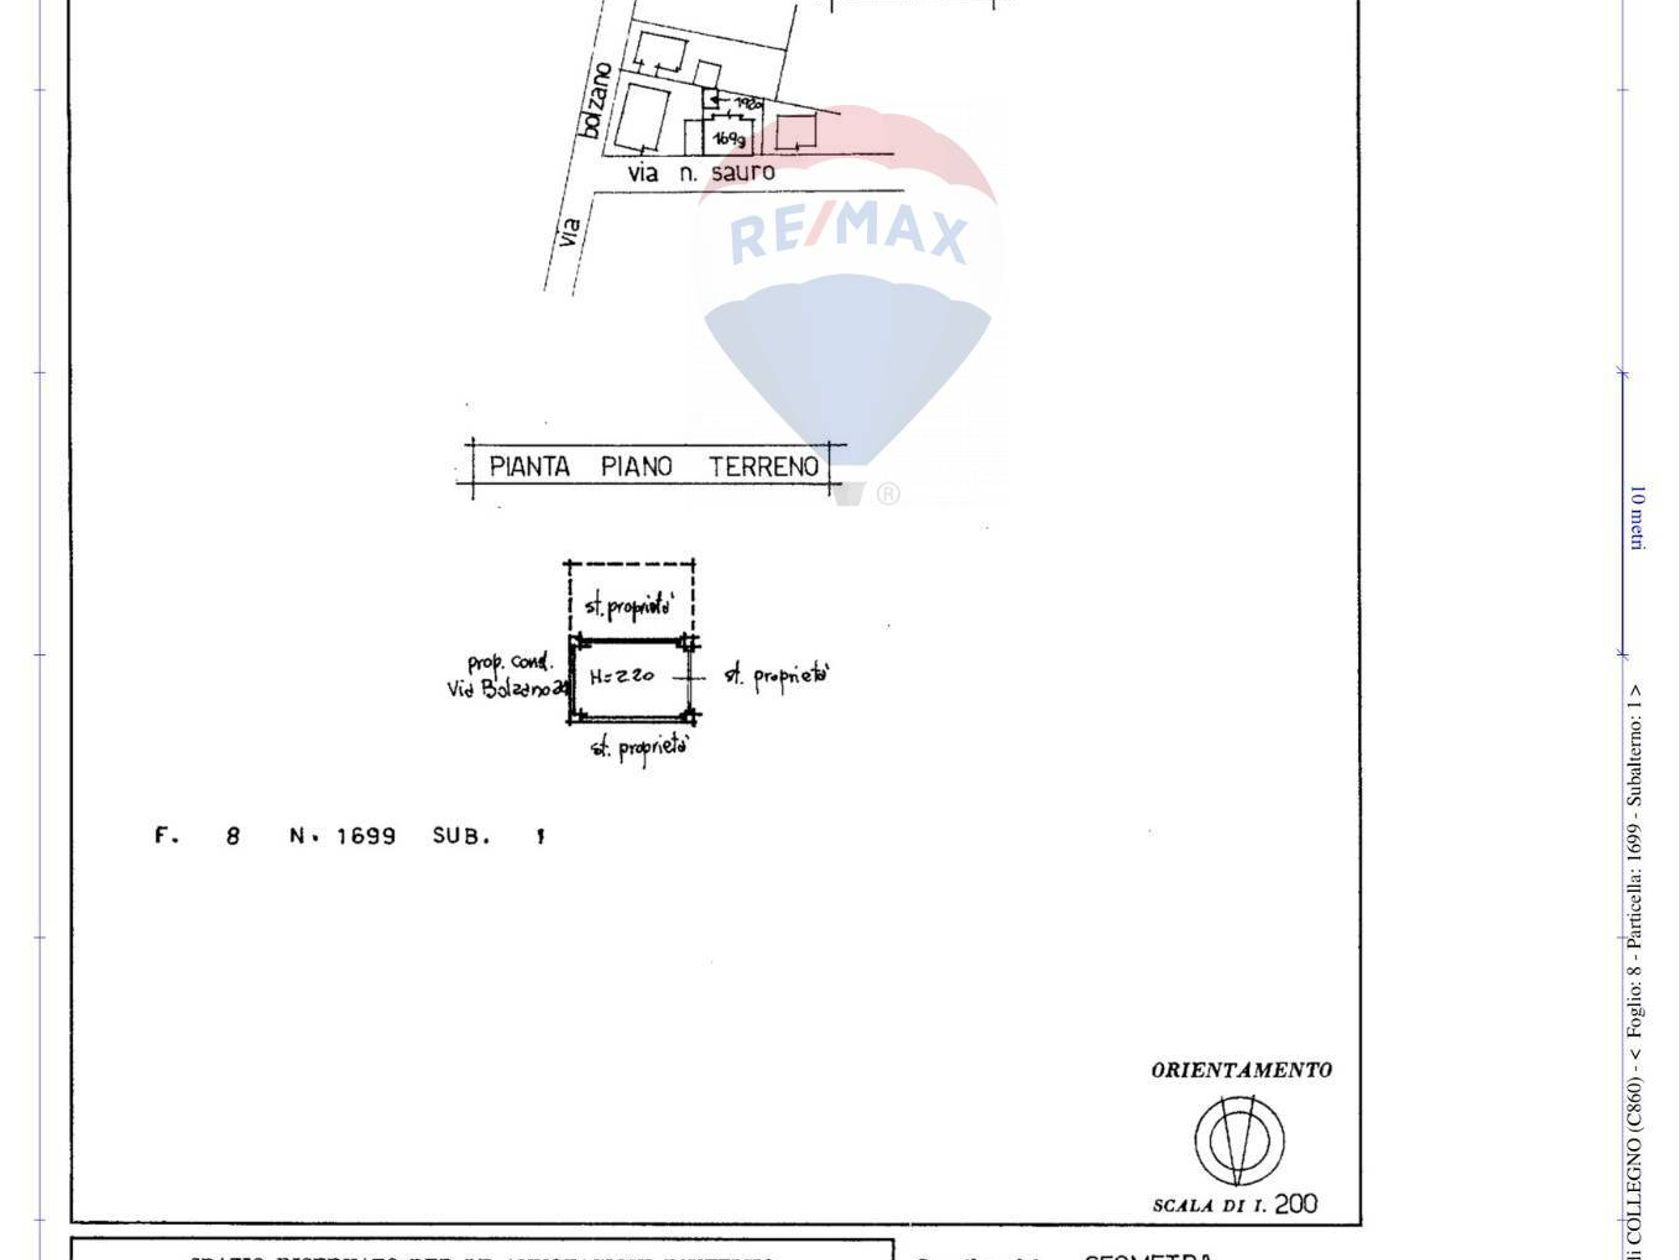 Casa Indipendente Santa Maria, Collegno, TO Vendita - Planimetria 7